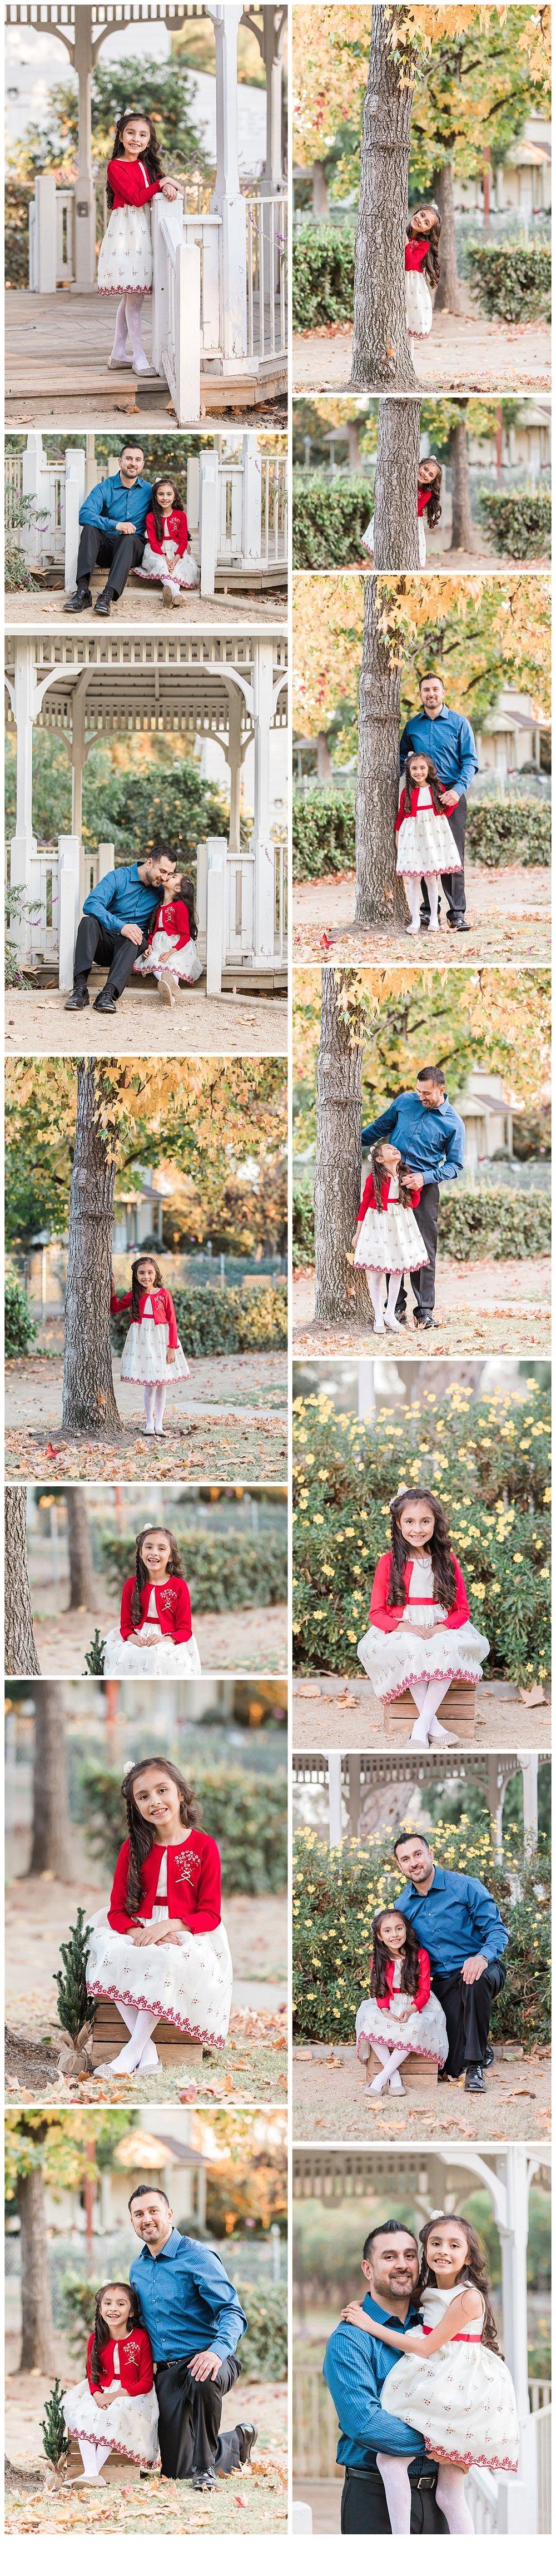 Loera Family | Family Photography | La Verne, CA